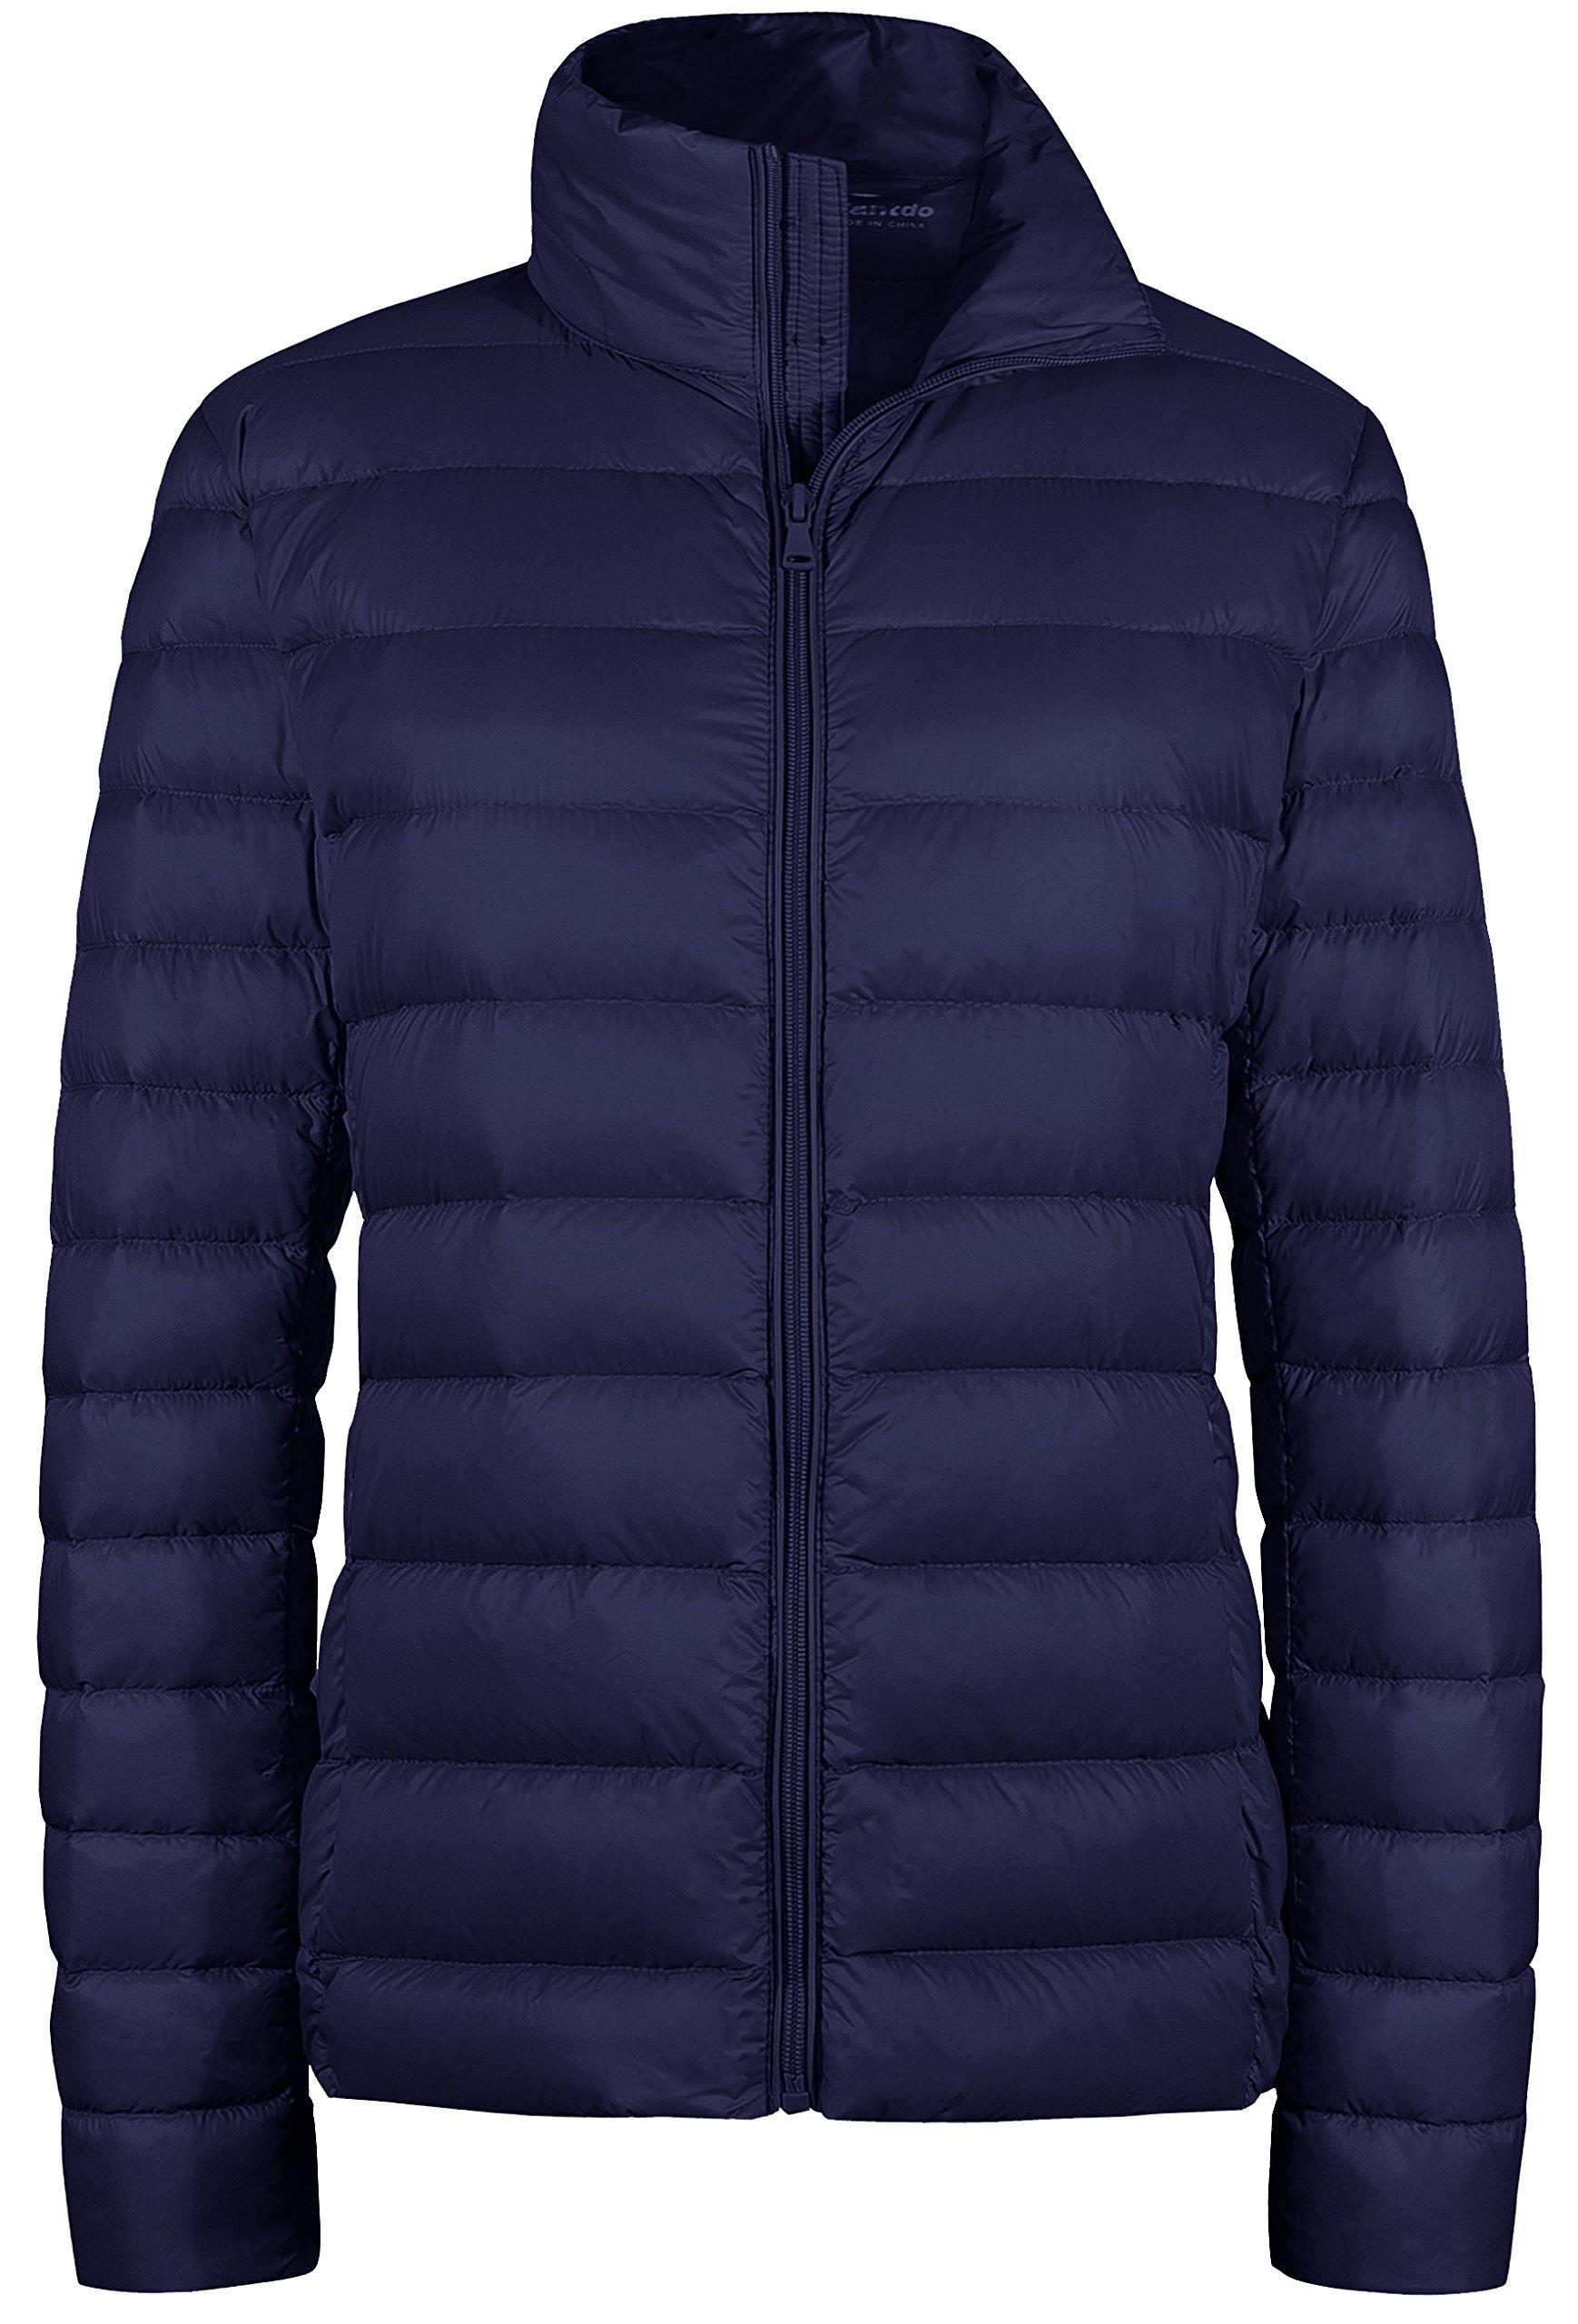 Wantdo Womens Puffer Jacket Outwear Packable Light Weight Down Coat Navy Medium by Wantdo